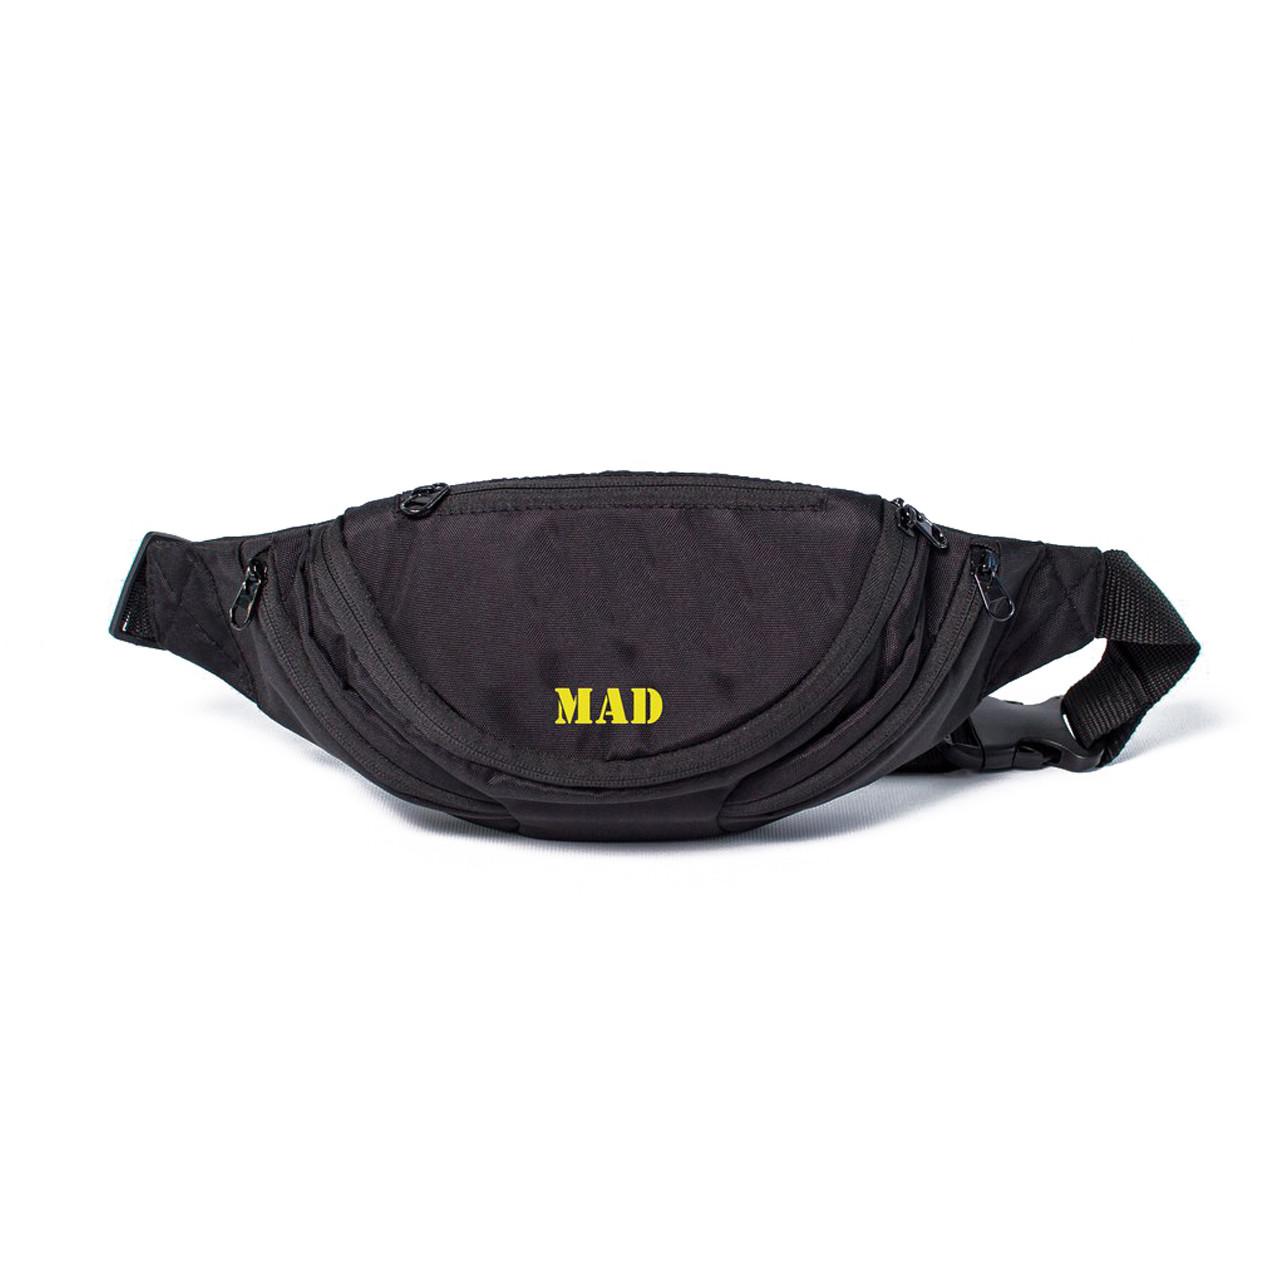 Поясная сумка Shark черно-желтая от MAD | born to win